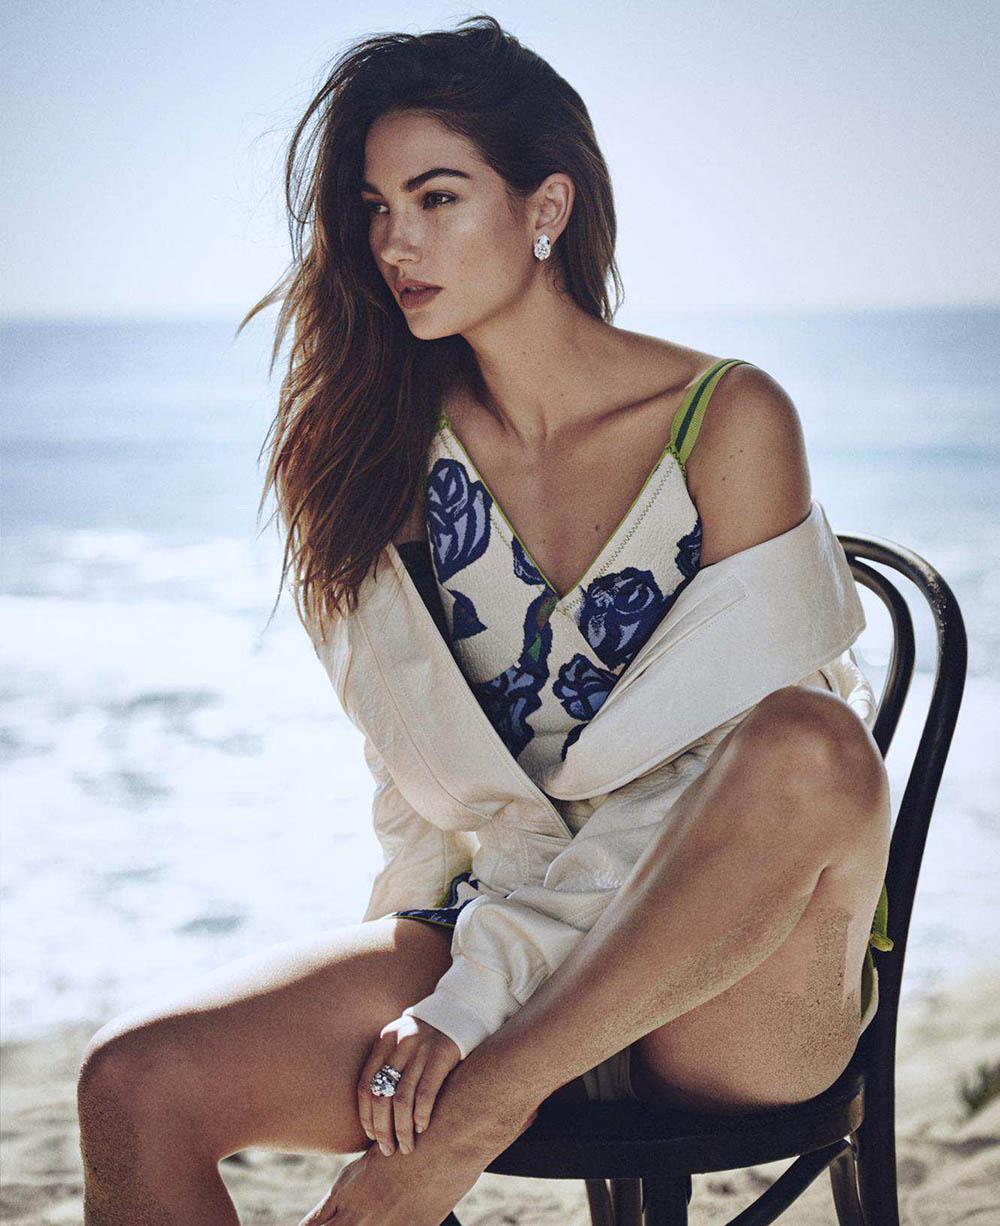 siêu mẫu Lily Aldridge